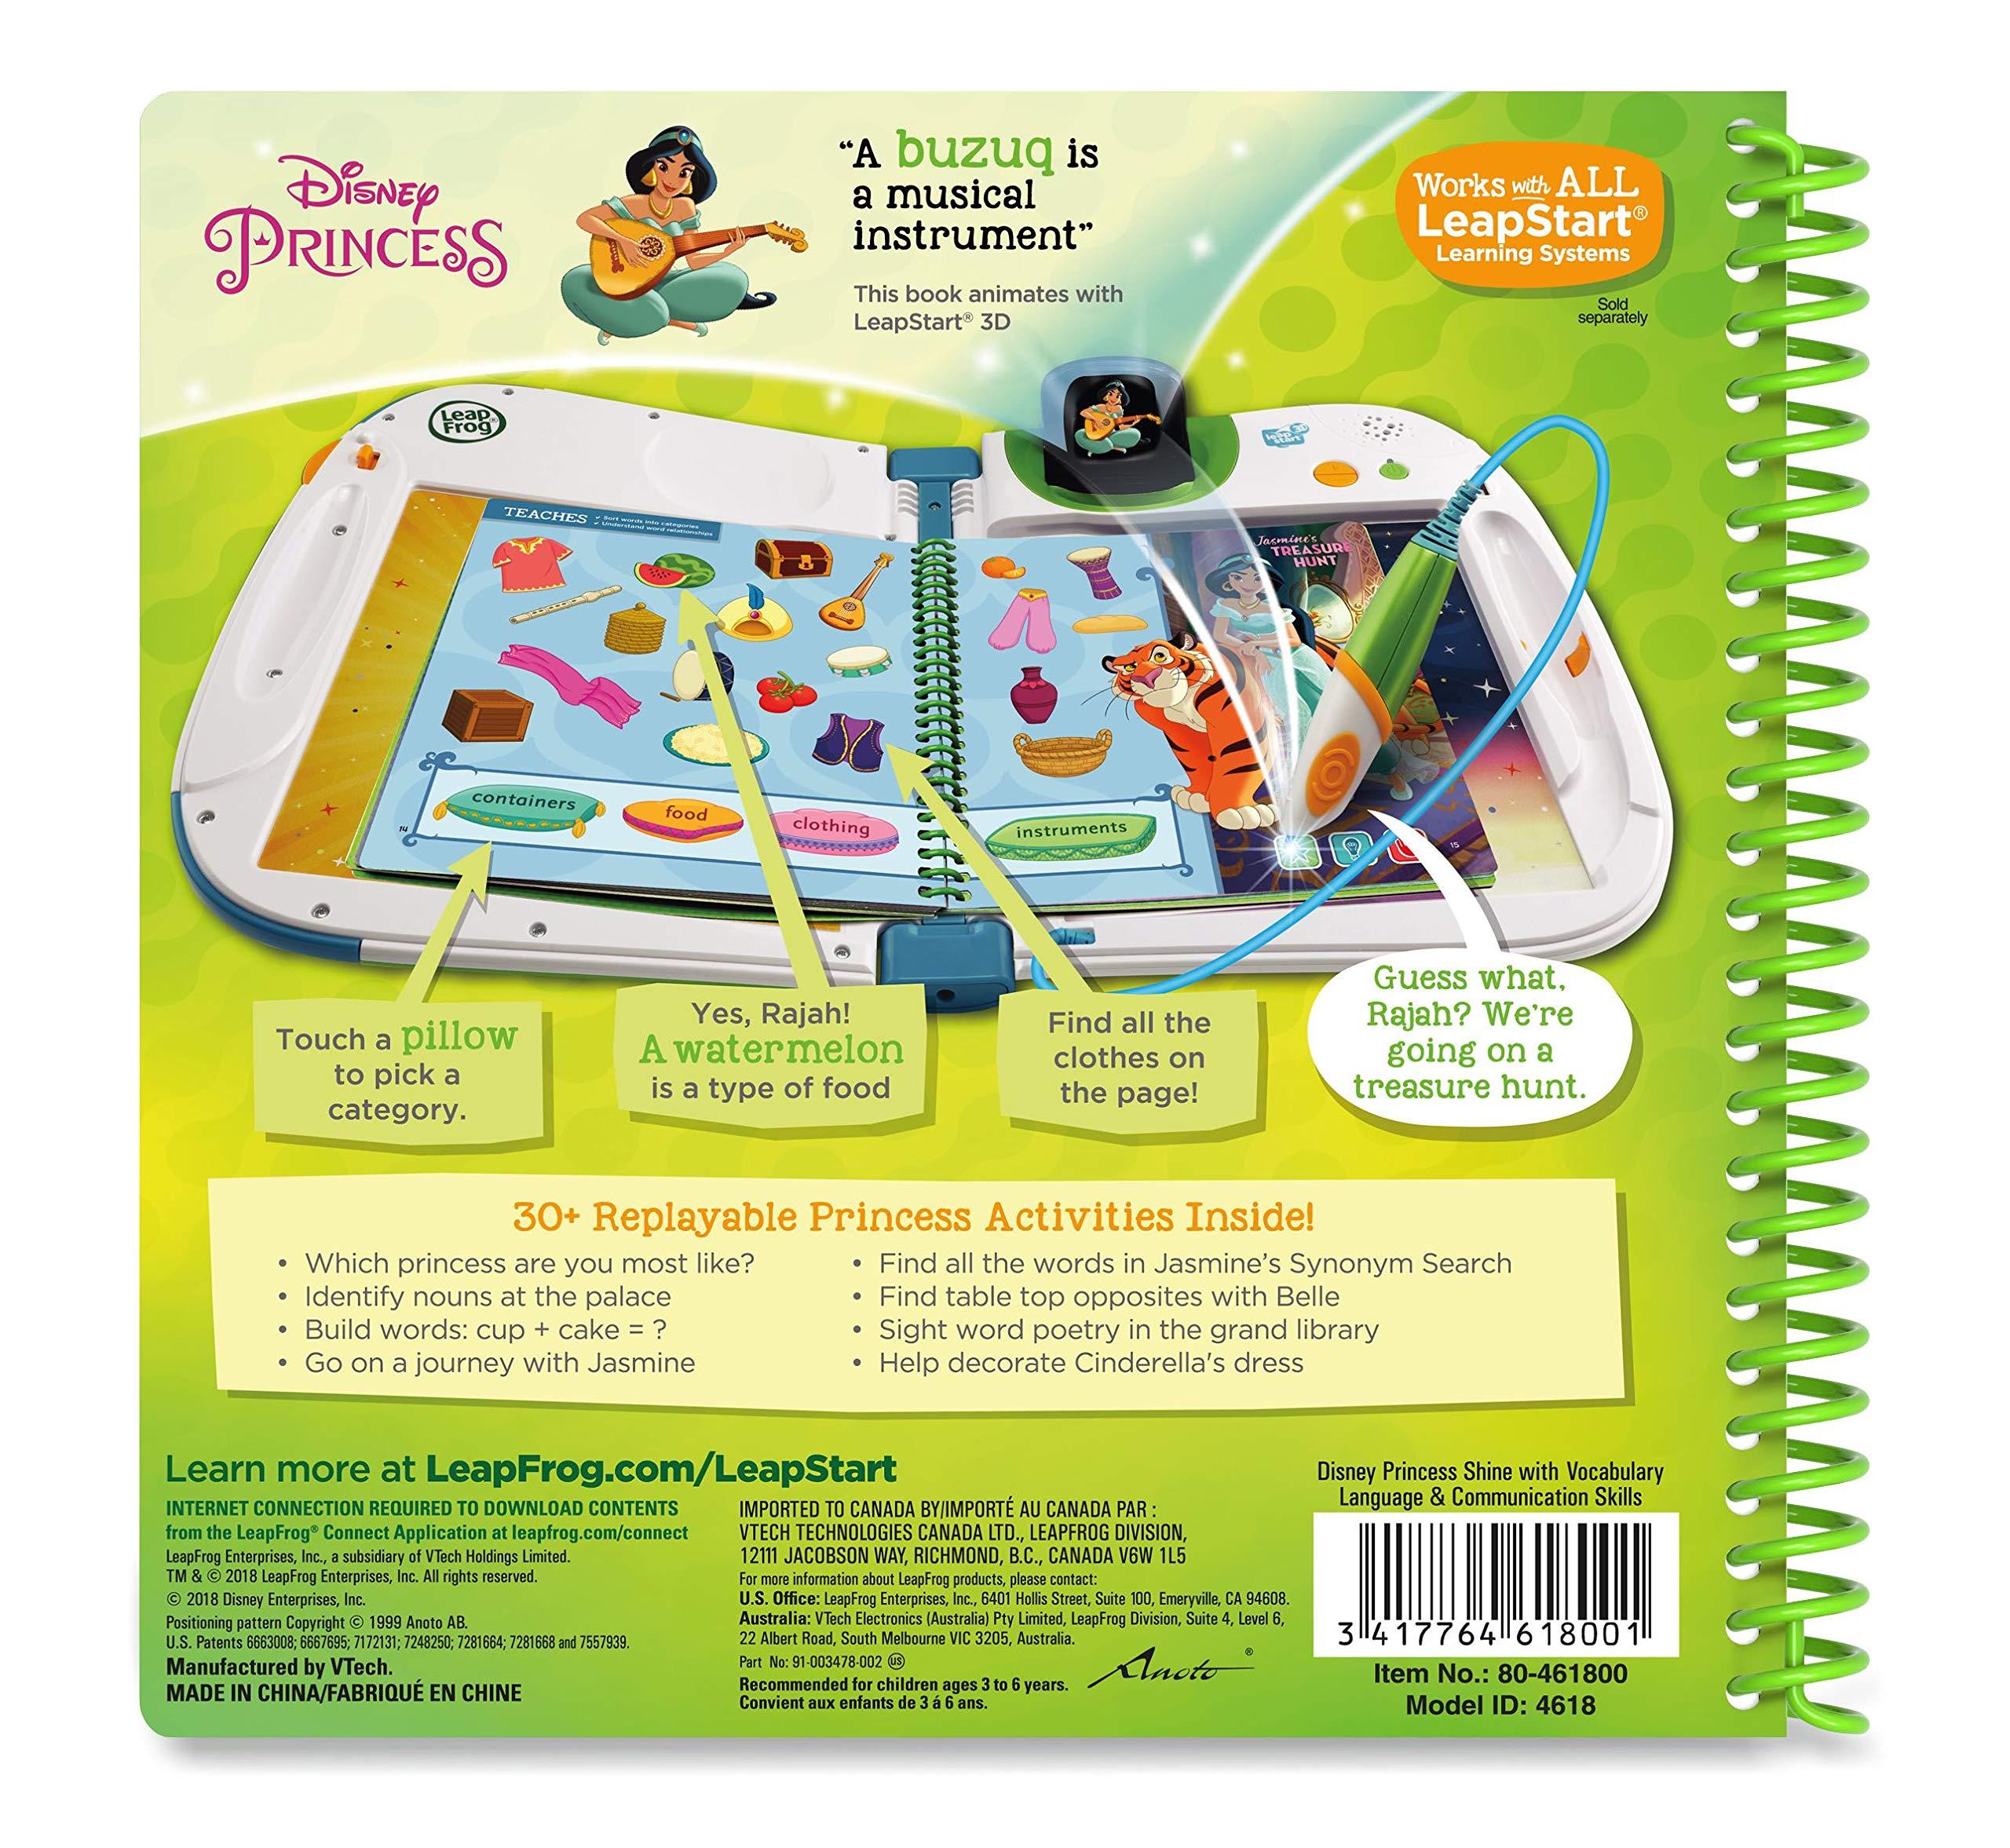 Leapstart Preschool: Disney Princess Shine with Vocabulary Activity Book (3D Enhanced) by LeapFrog (Image #2)